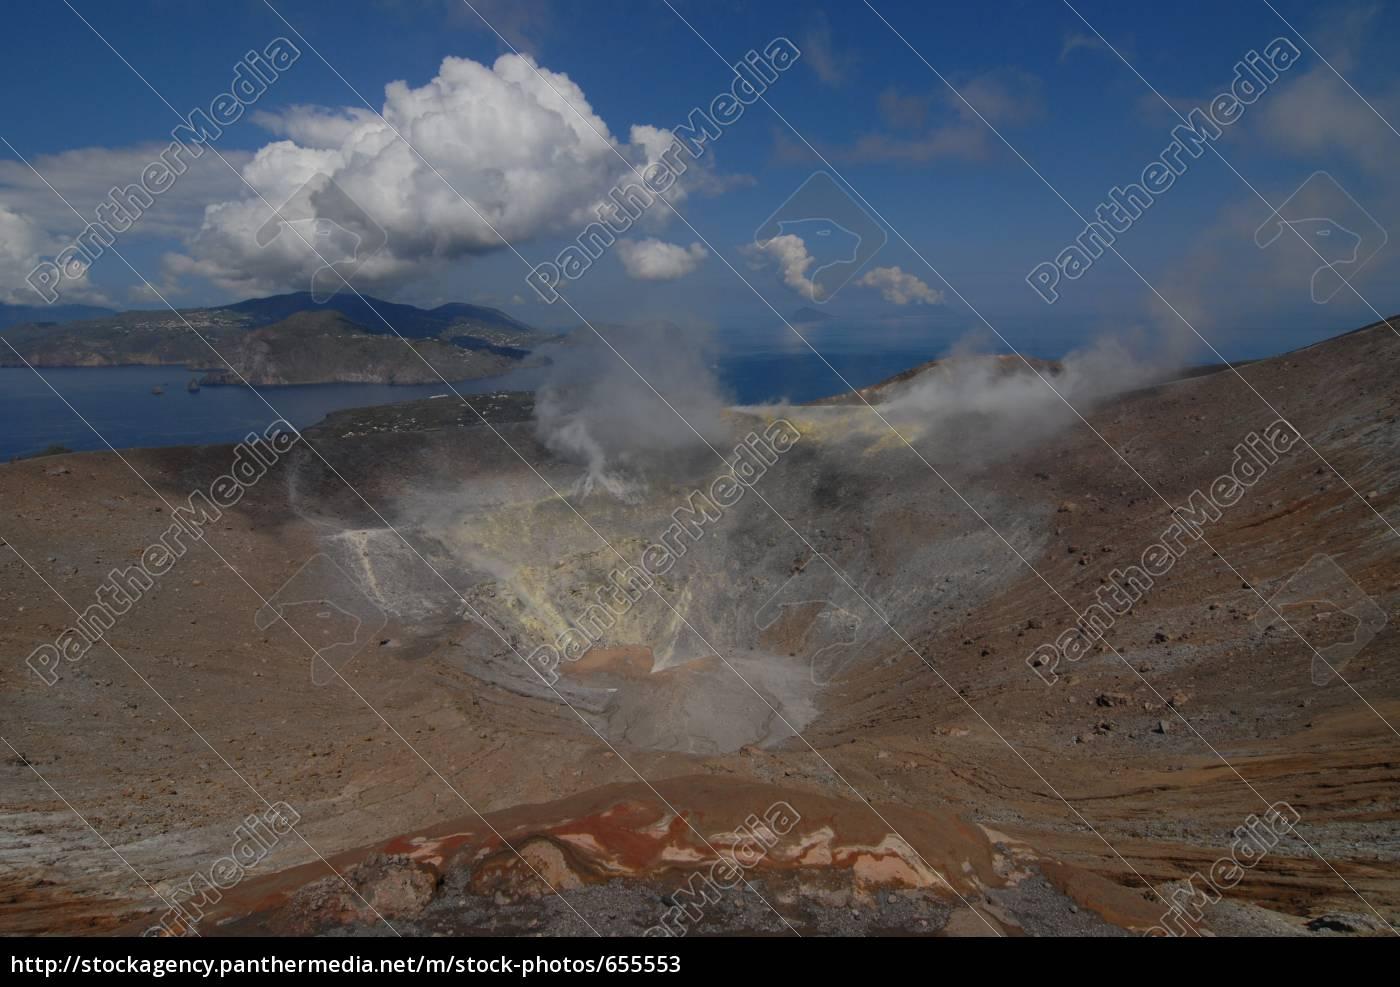 grand, crater, of, vulcano - 655553